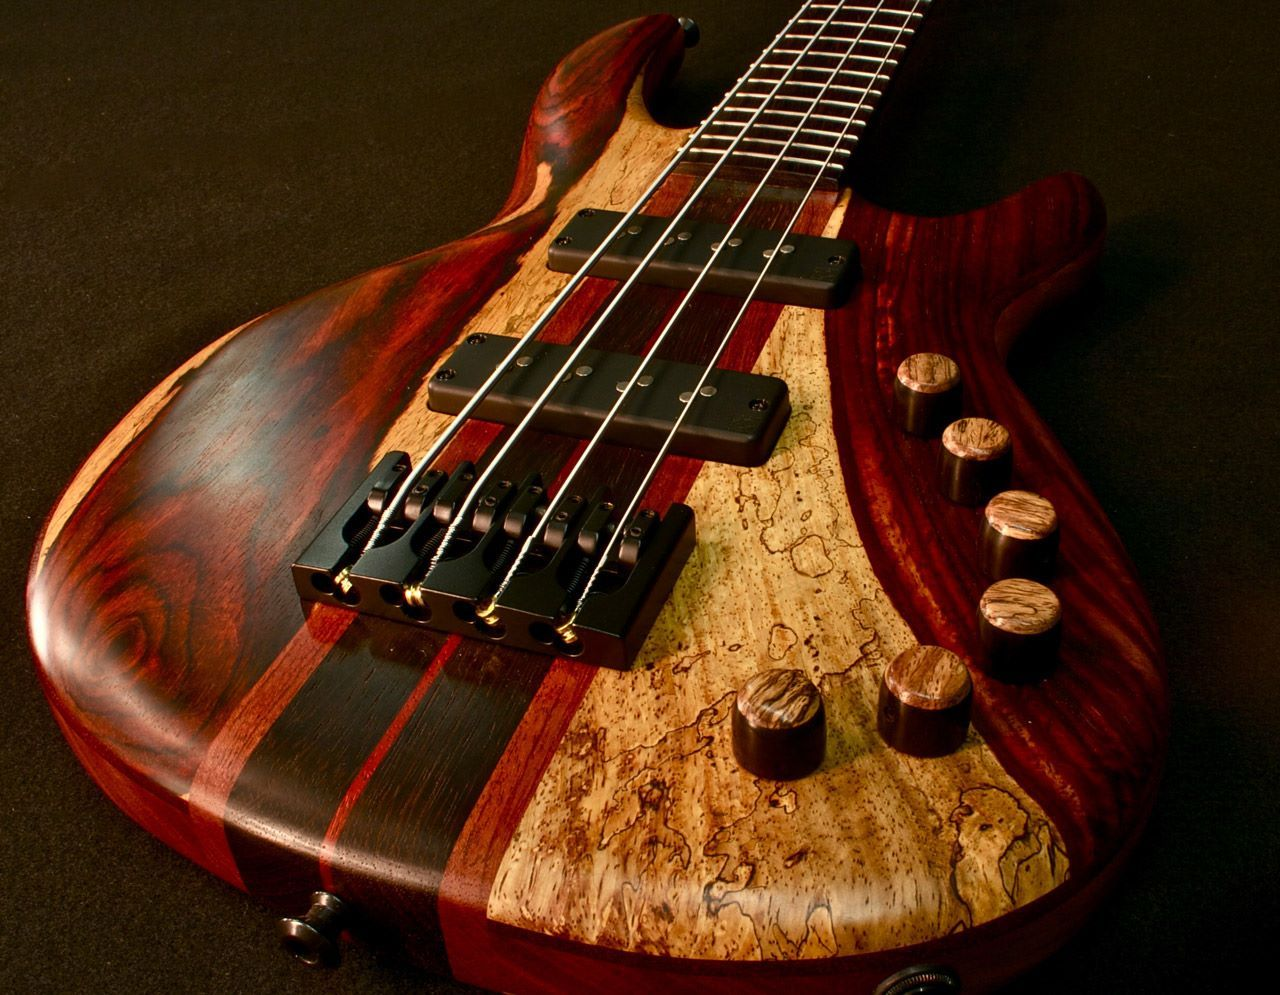 wyn guitars bass time pinterest guitars bass and. Black Bedroom Furniture Sets. Home Design Ideas